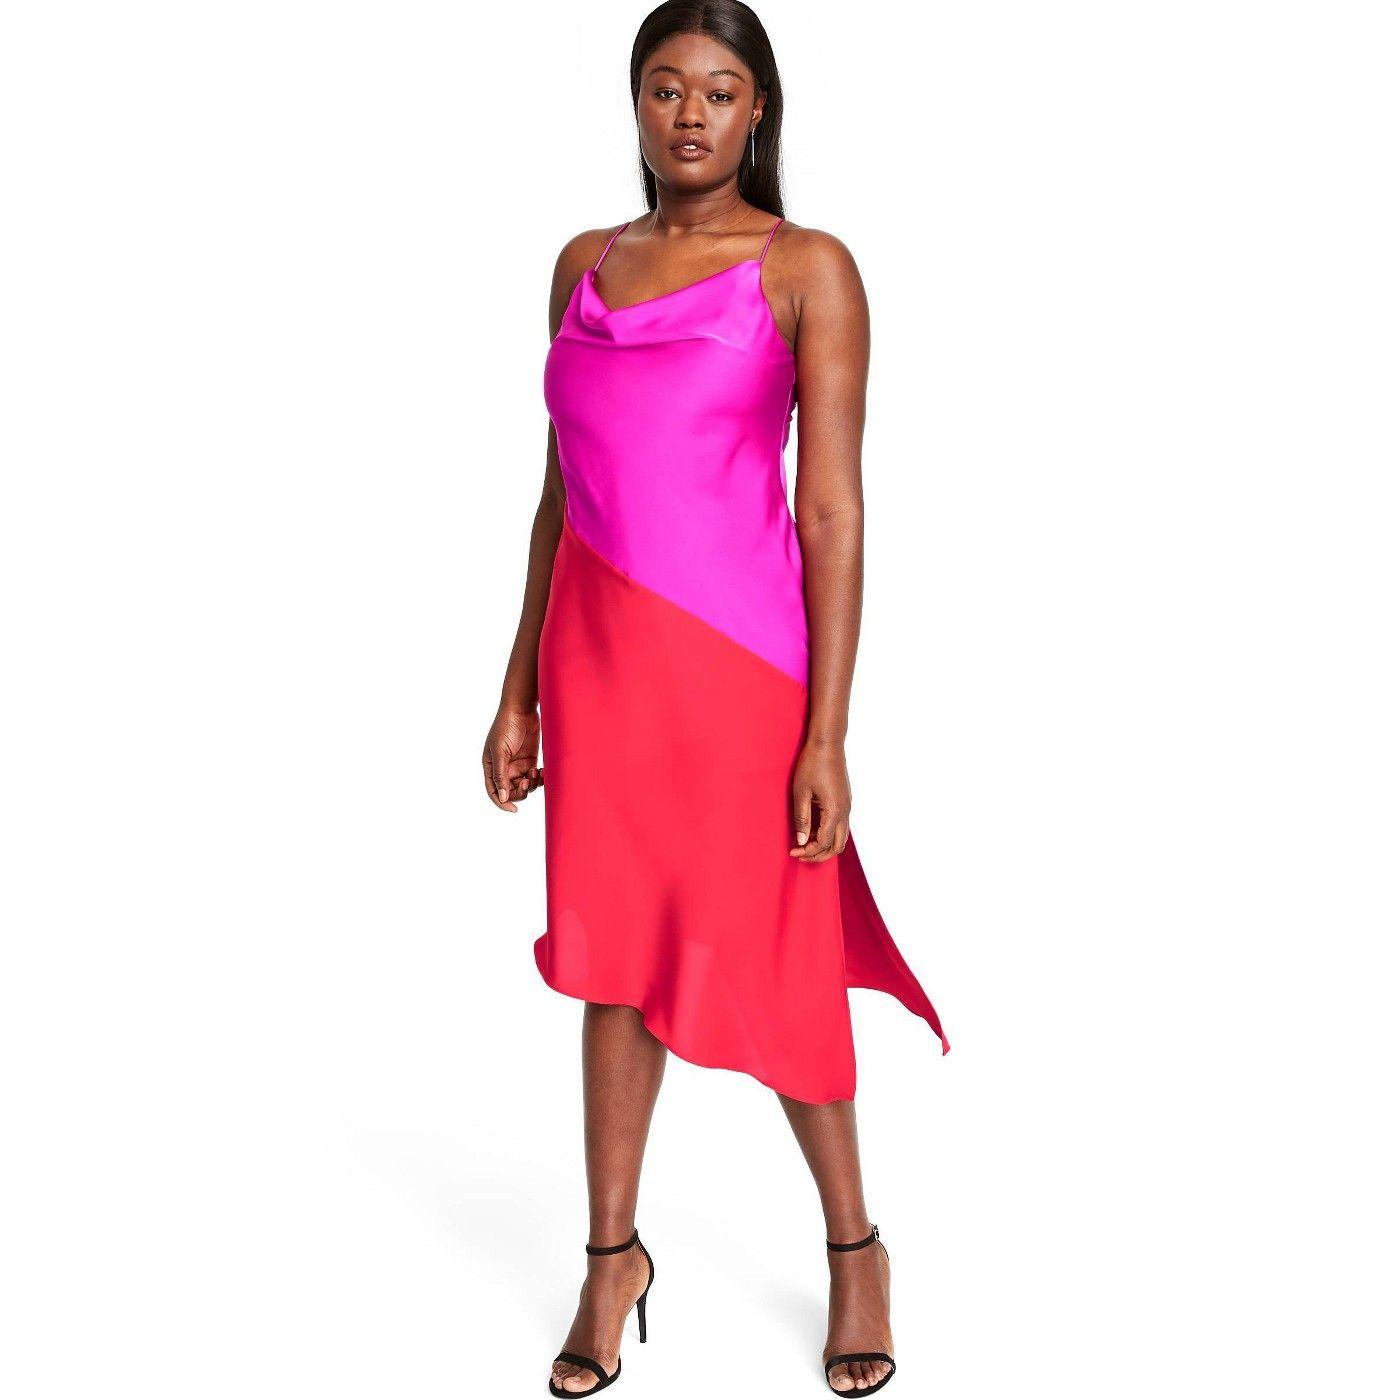 Women S Two Tone Slip Dress Cushnie For Target Regular Plus Magenta Pink Red Sponsored Dress Affiliate Cush Dresses Fall Fashion Outfits Slip Dress [ 1400 x 1400 Pixel ]